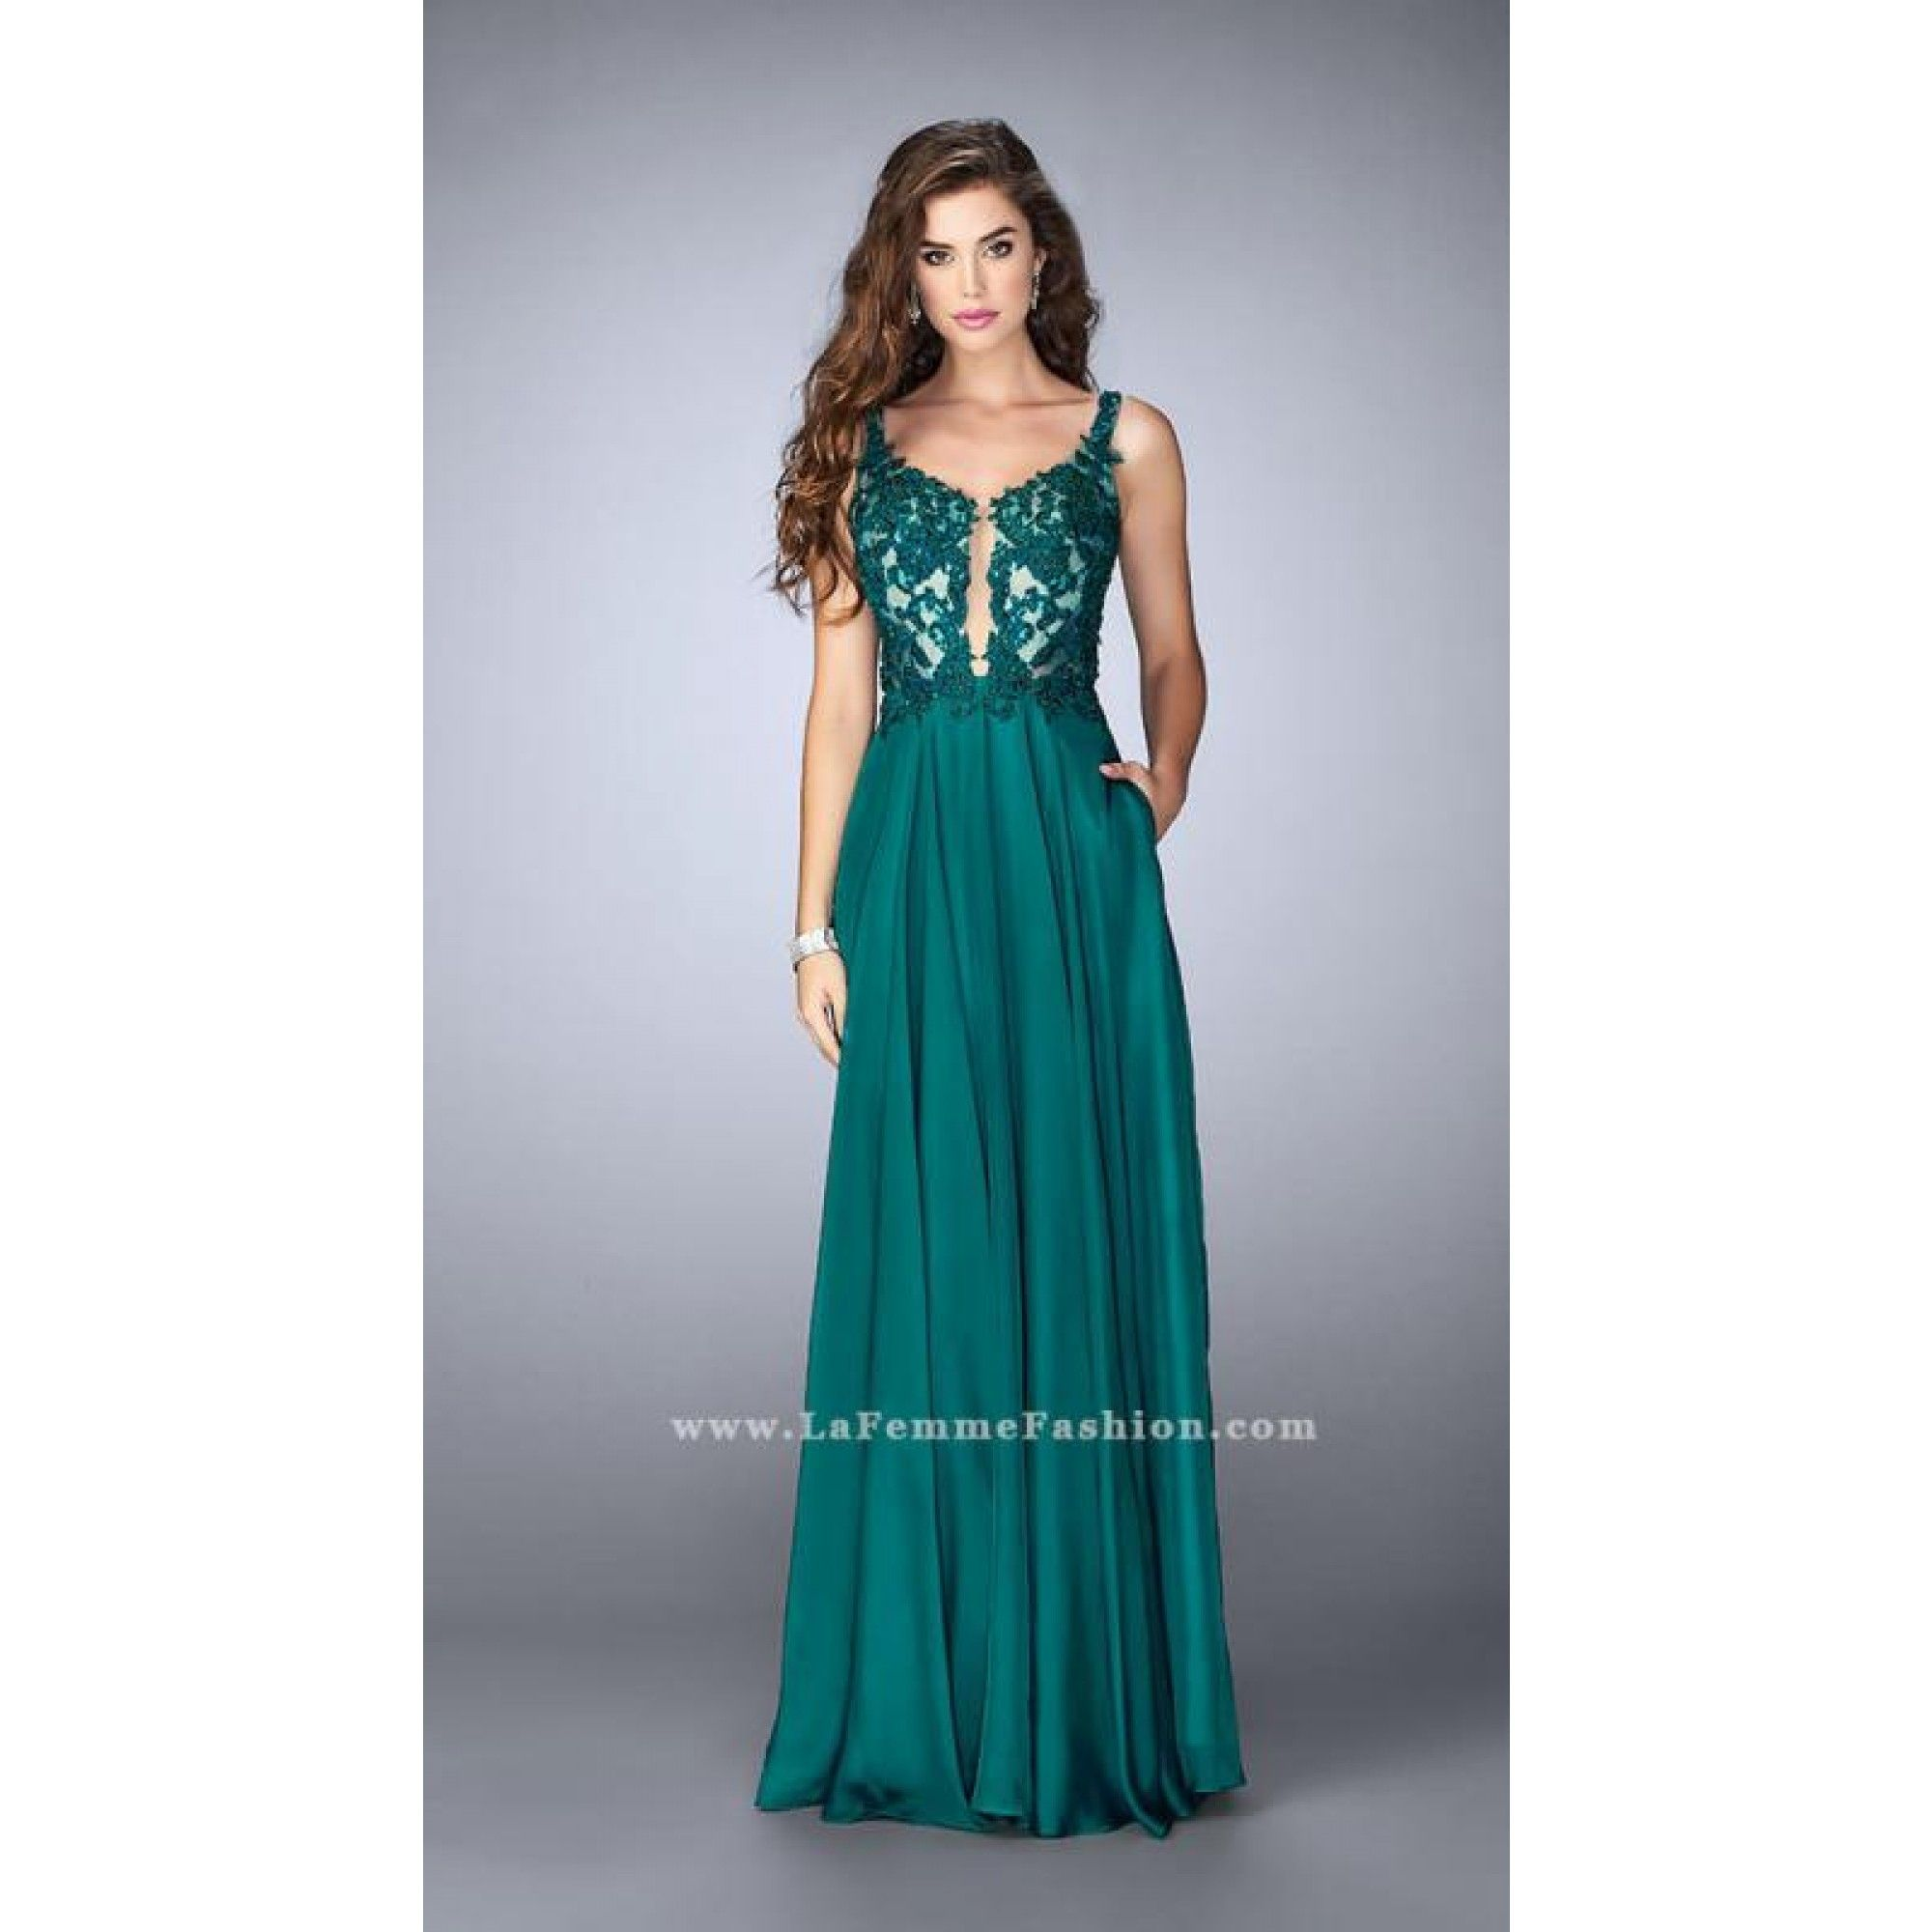 La Femme 23802|La Femme prom dress 23802|tampabridalshops.com|La ...